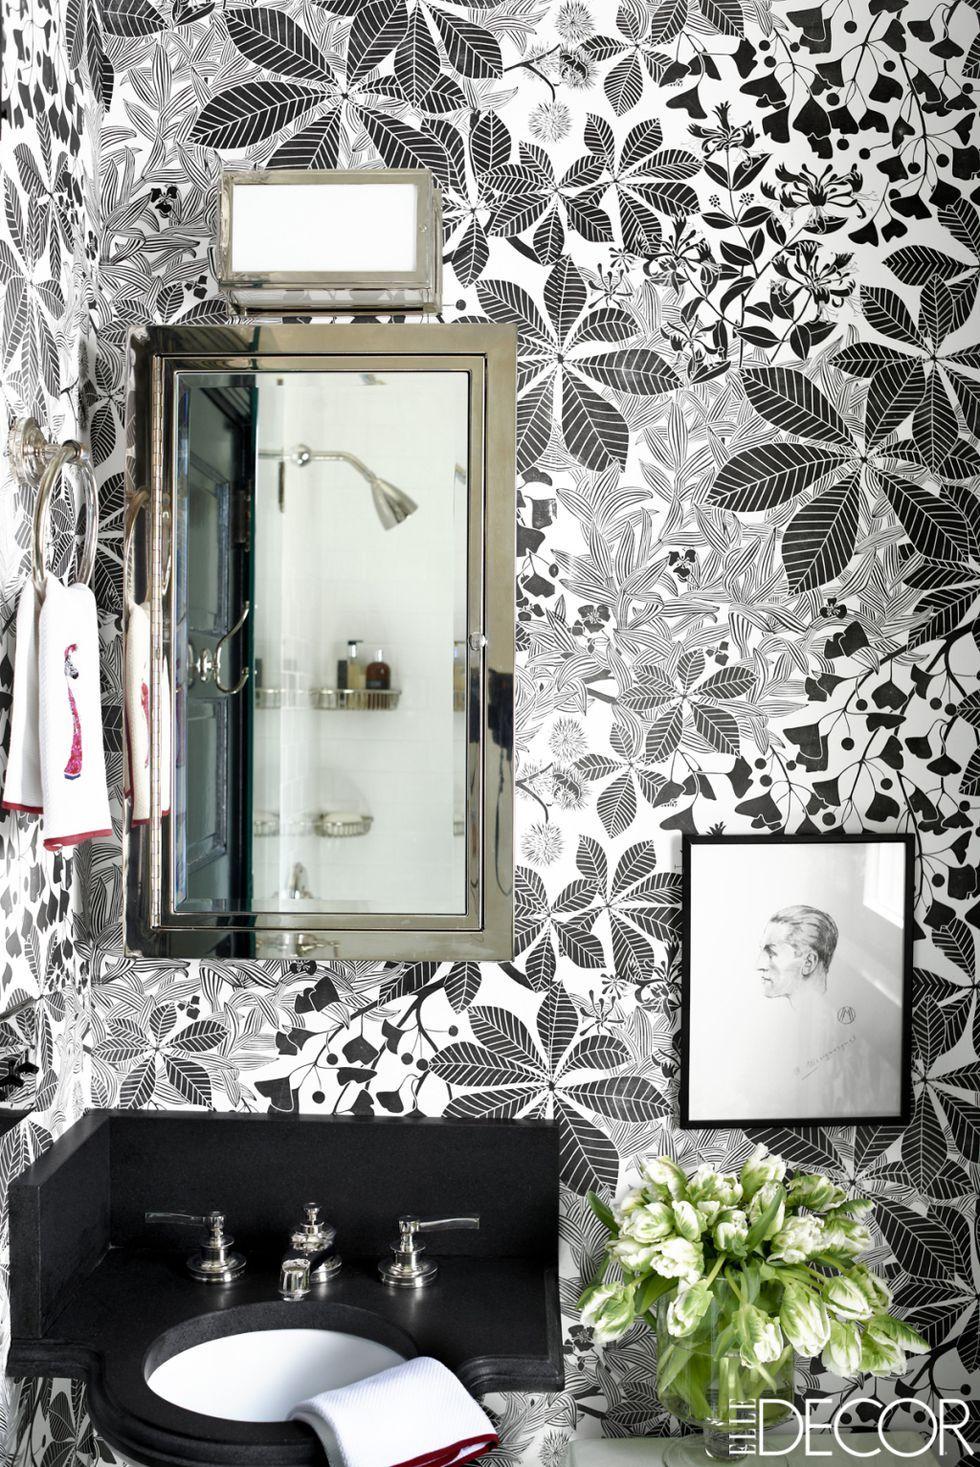 Best Bathroom Wallpaper Ideas - 17 Beautiful Bathroom Wall Coverings